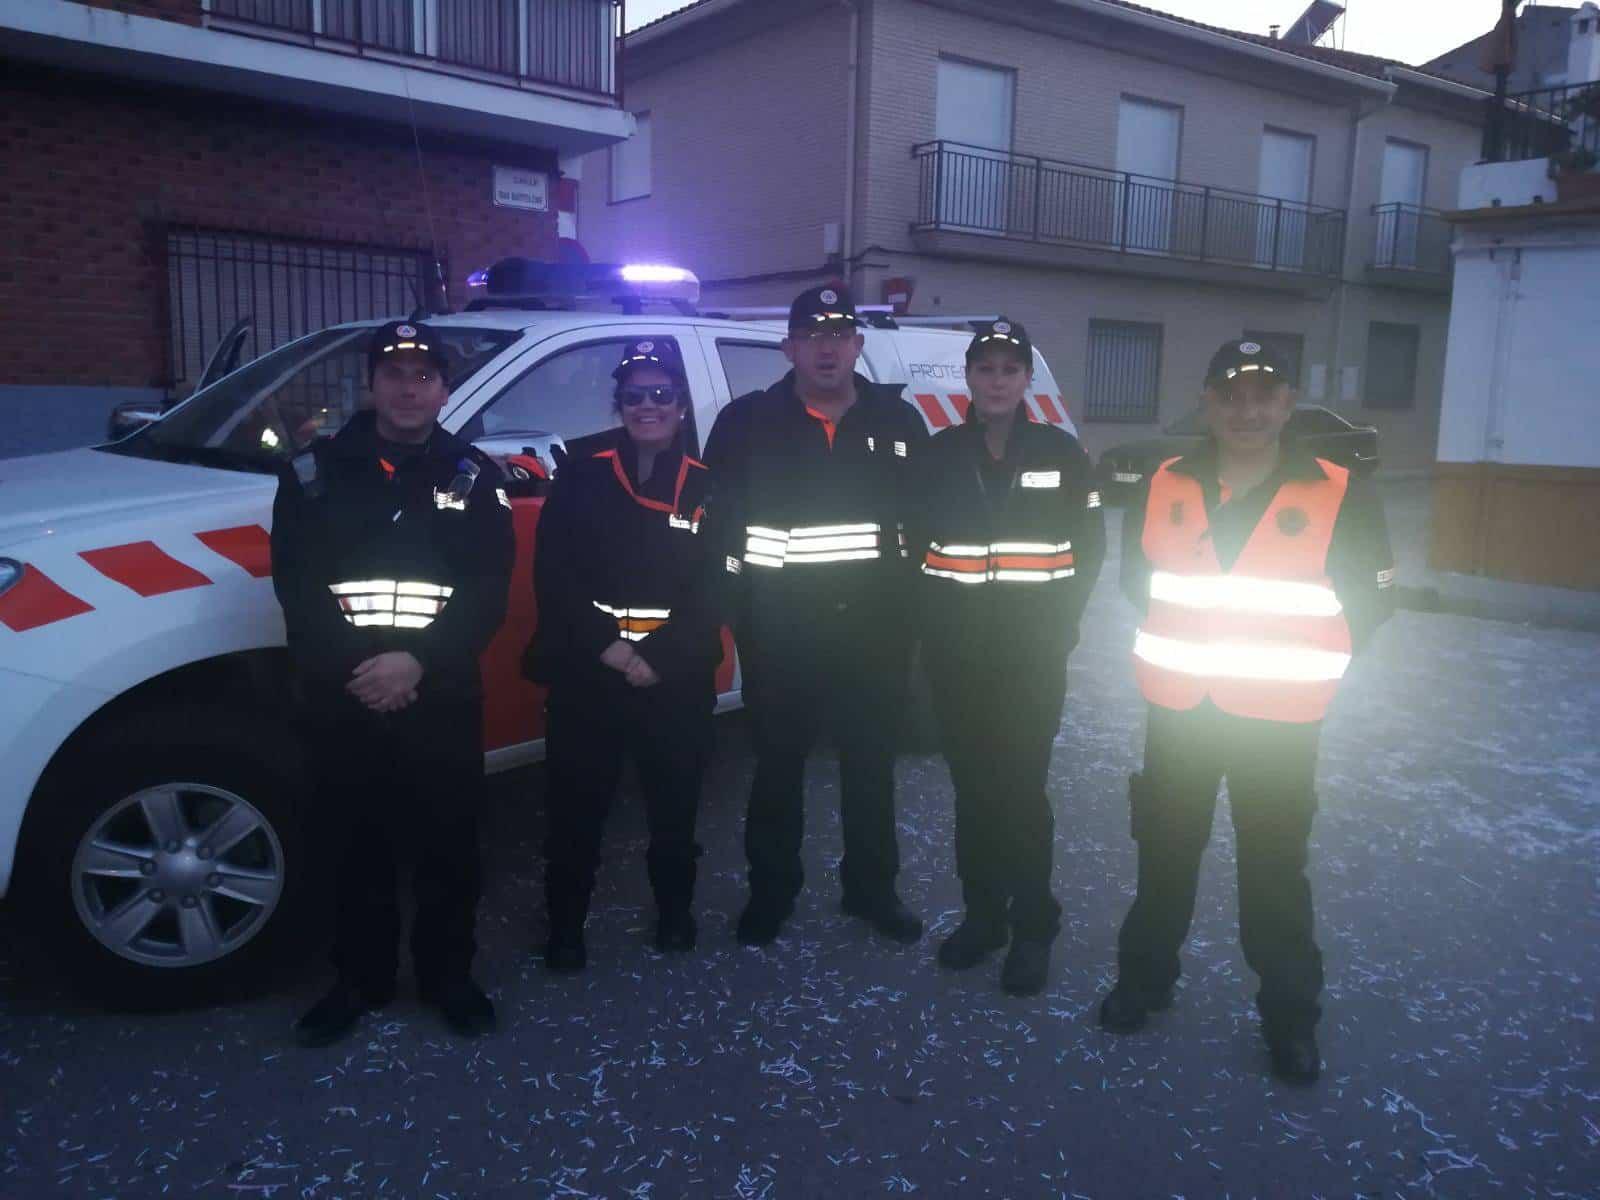 proteccion civil desfile domingo deseosas - Preventivo de Protección Civil en el Domingo de las Deseosas